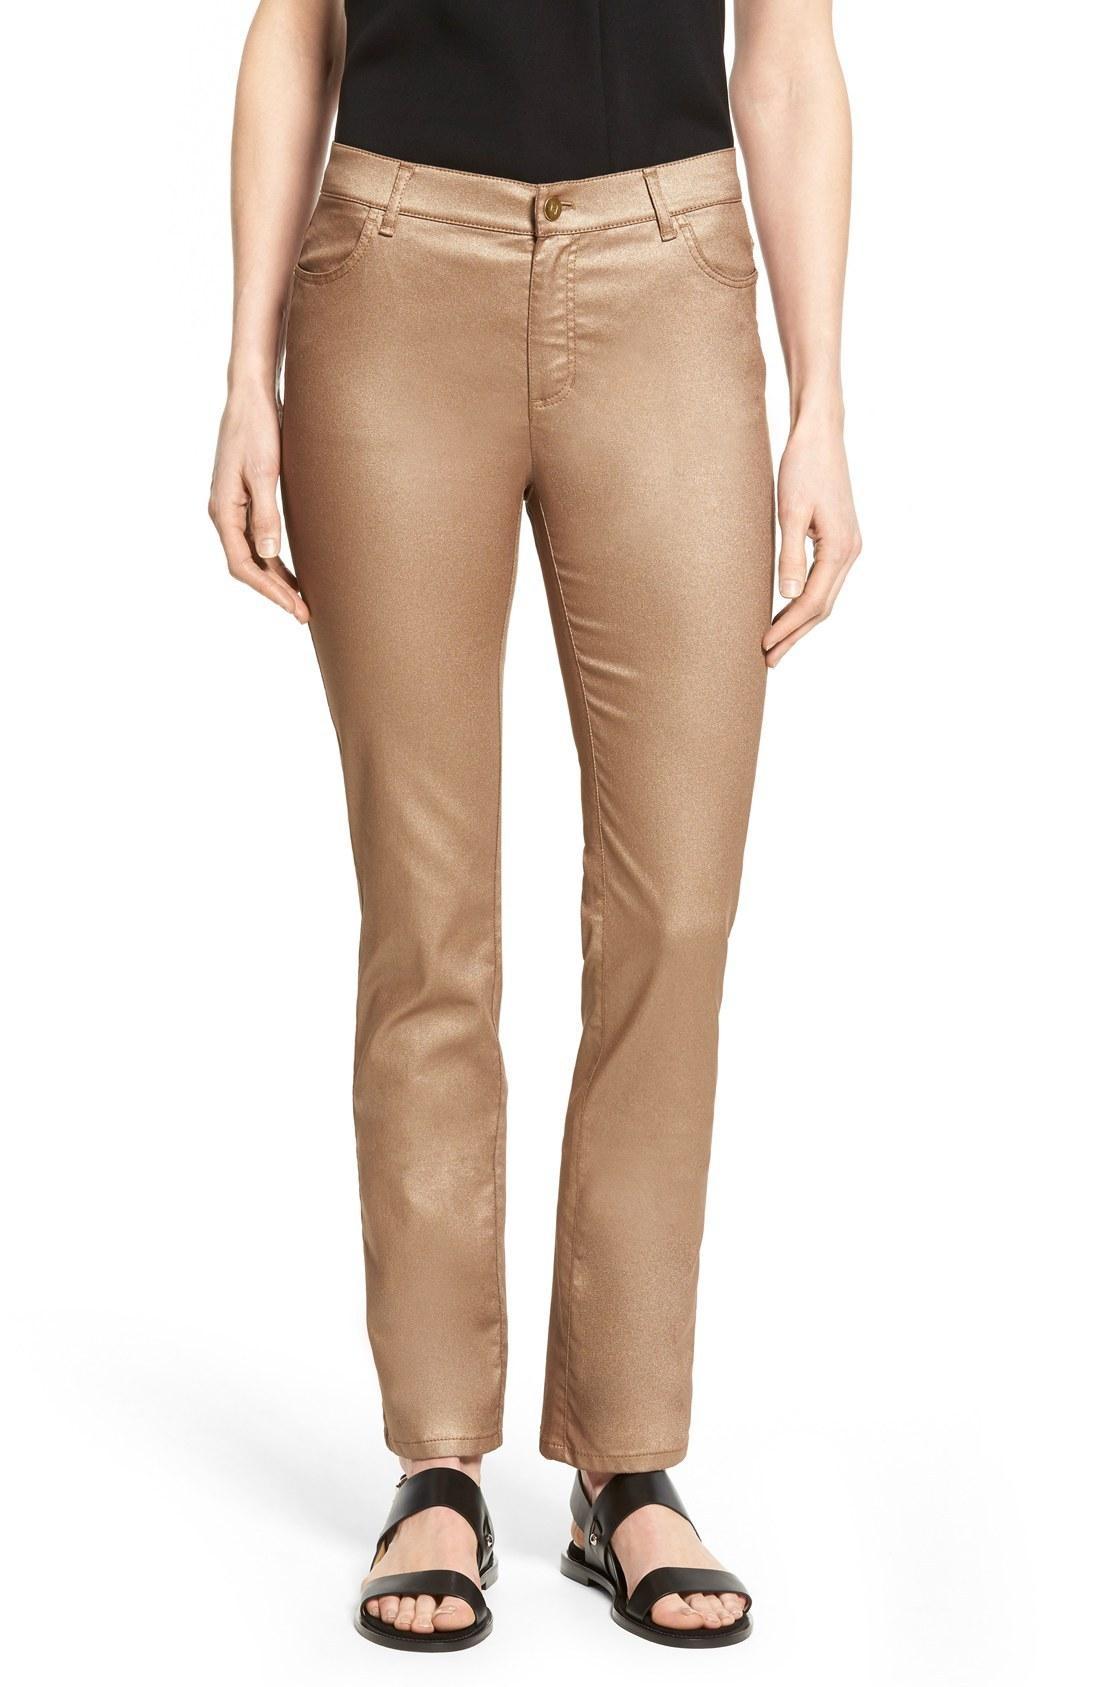 Lafayette 148 Curvy Fit Skinny Jeans In Gold